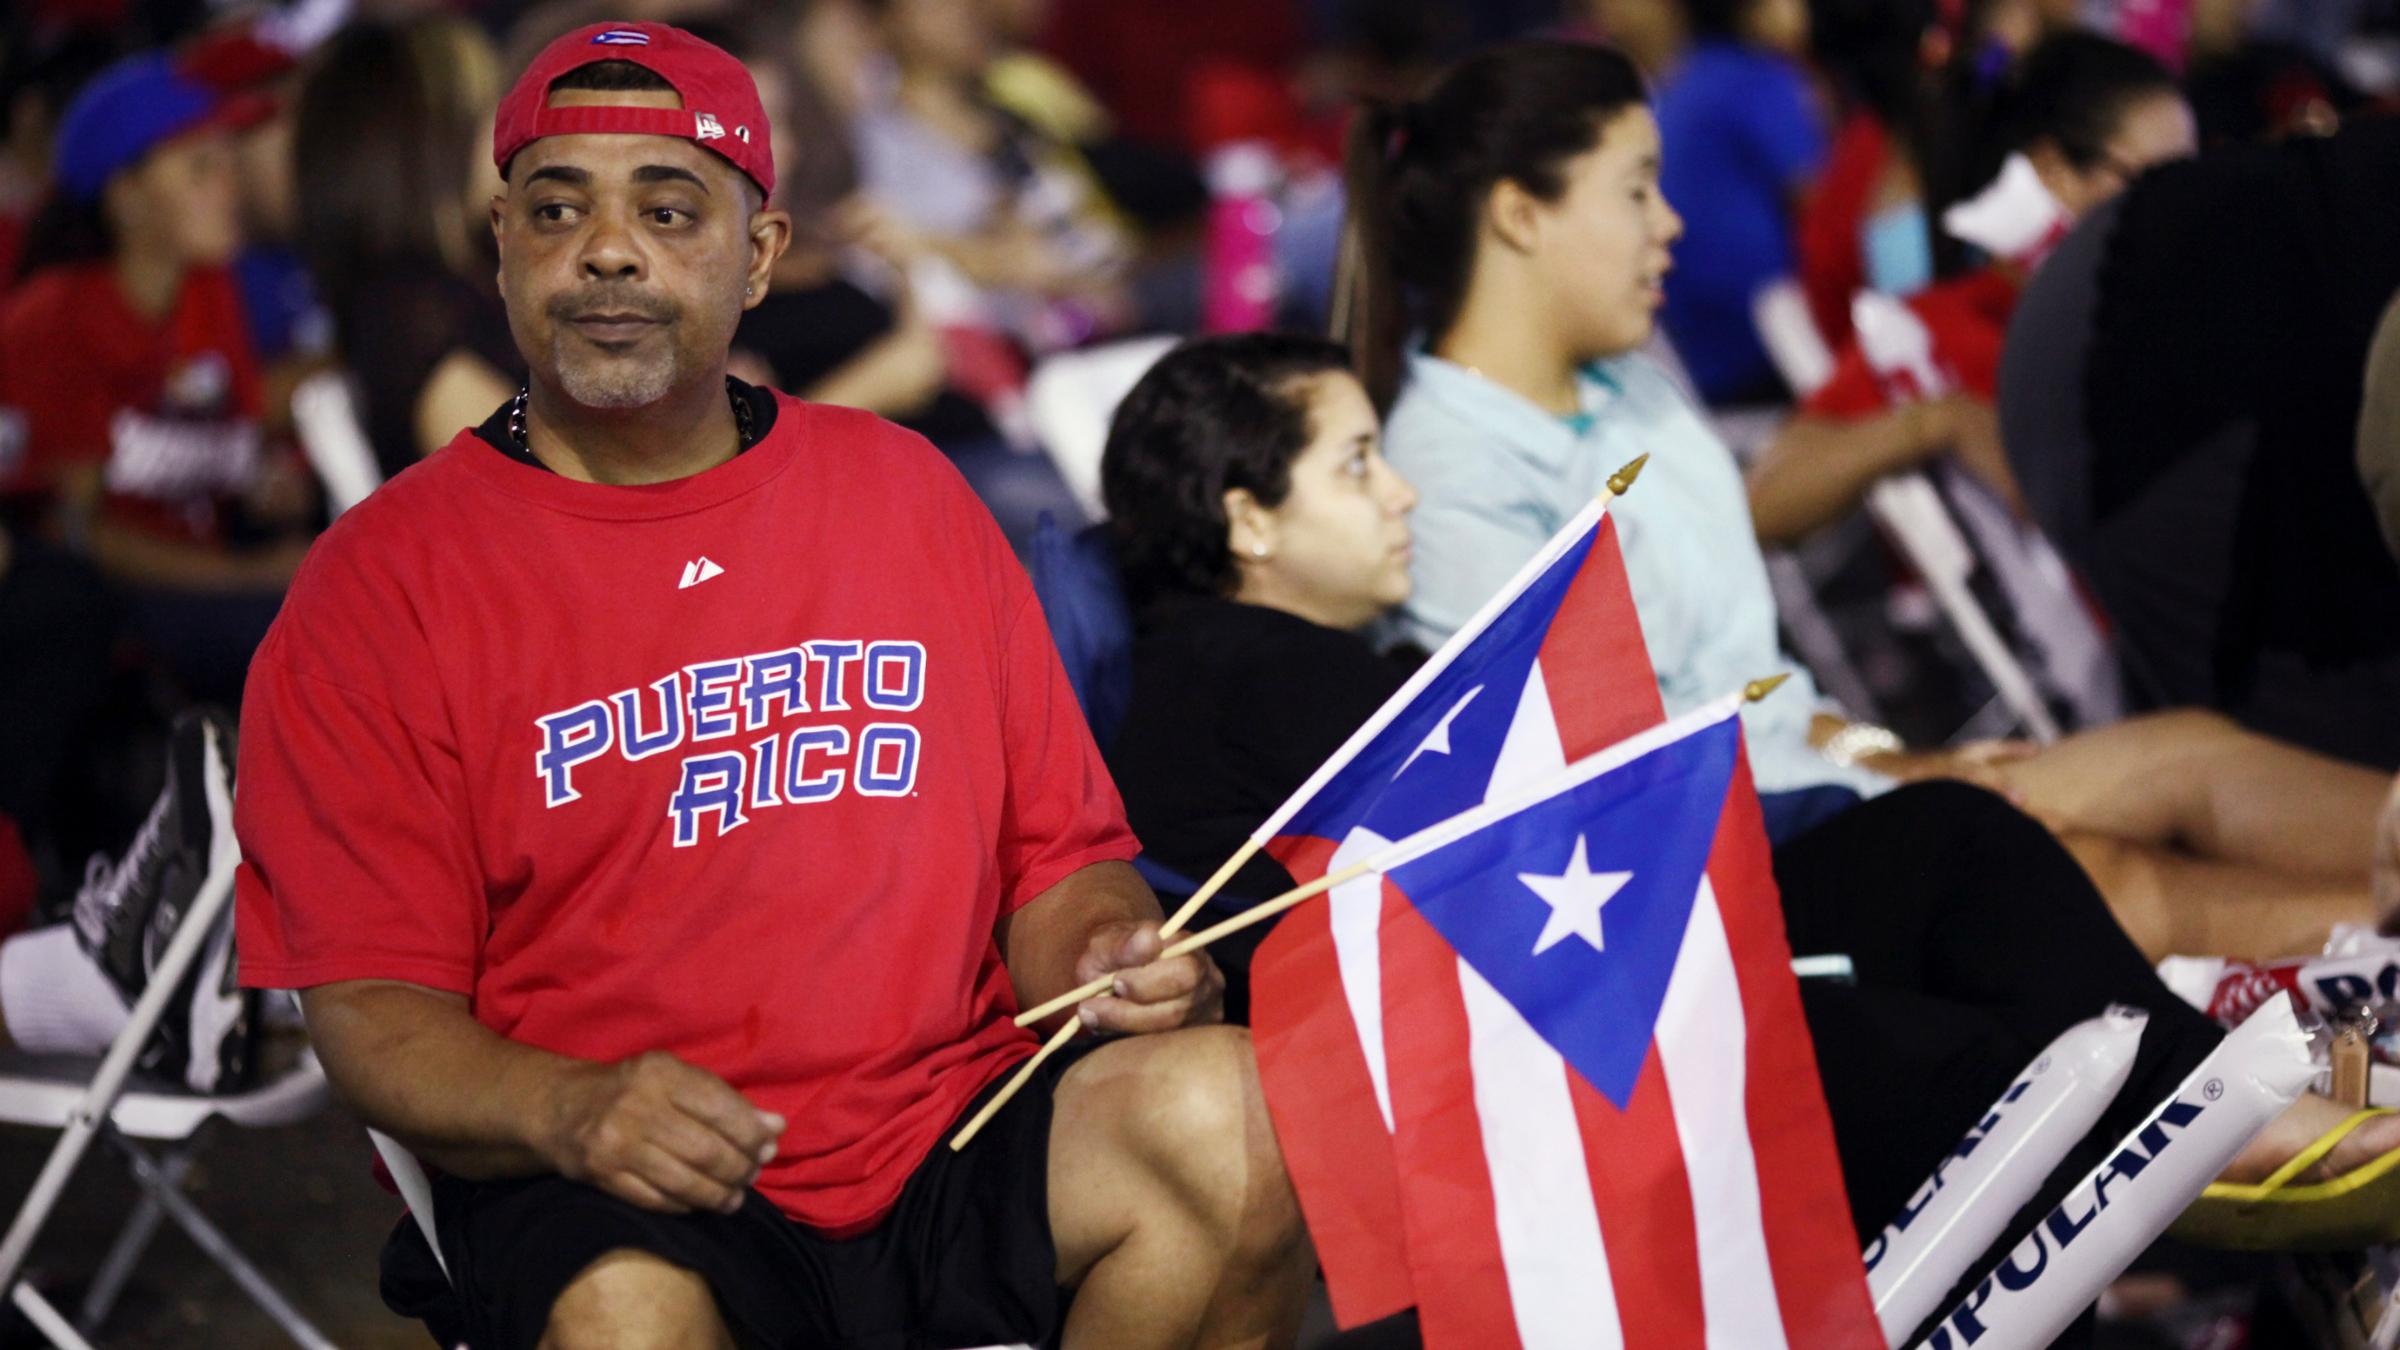 Puerto Rican flags